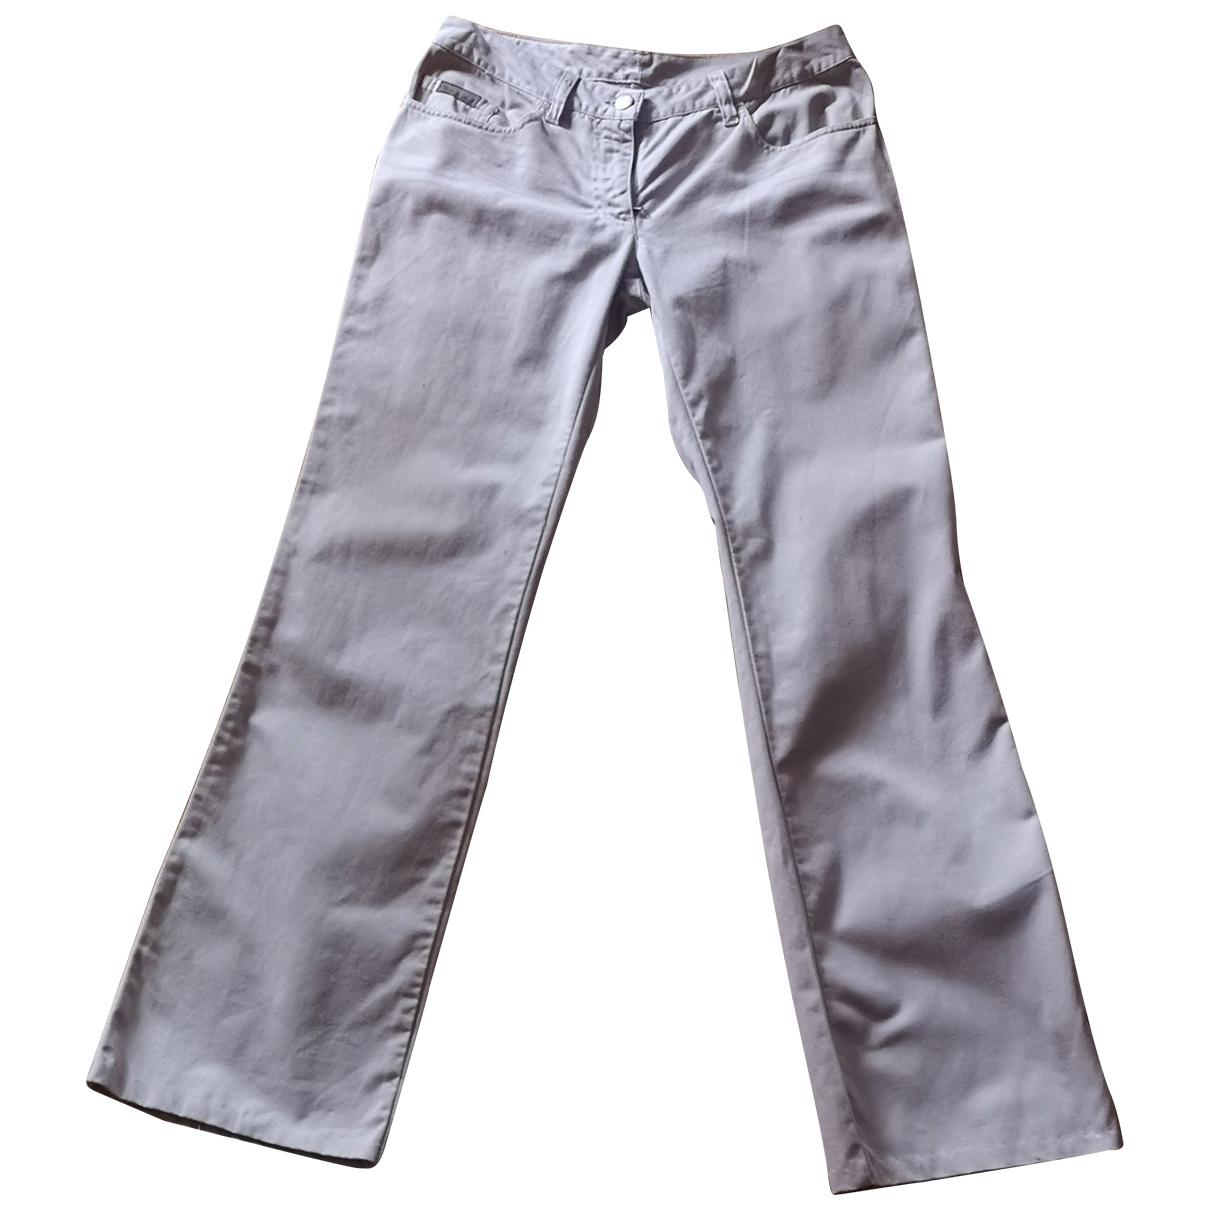 Pantalon recto D&g